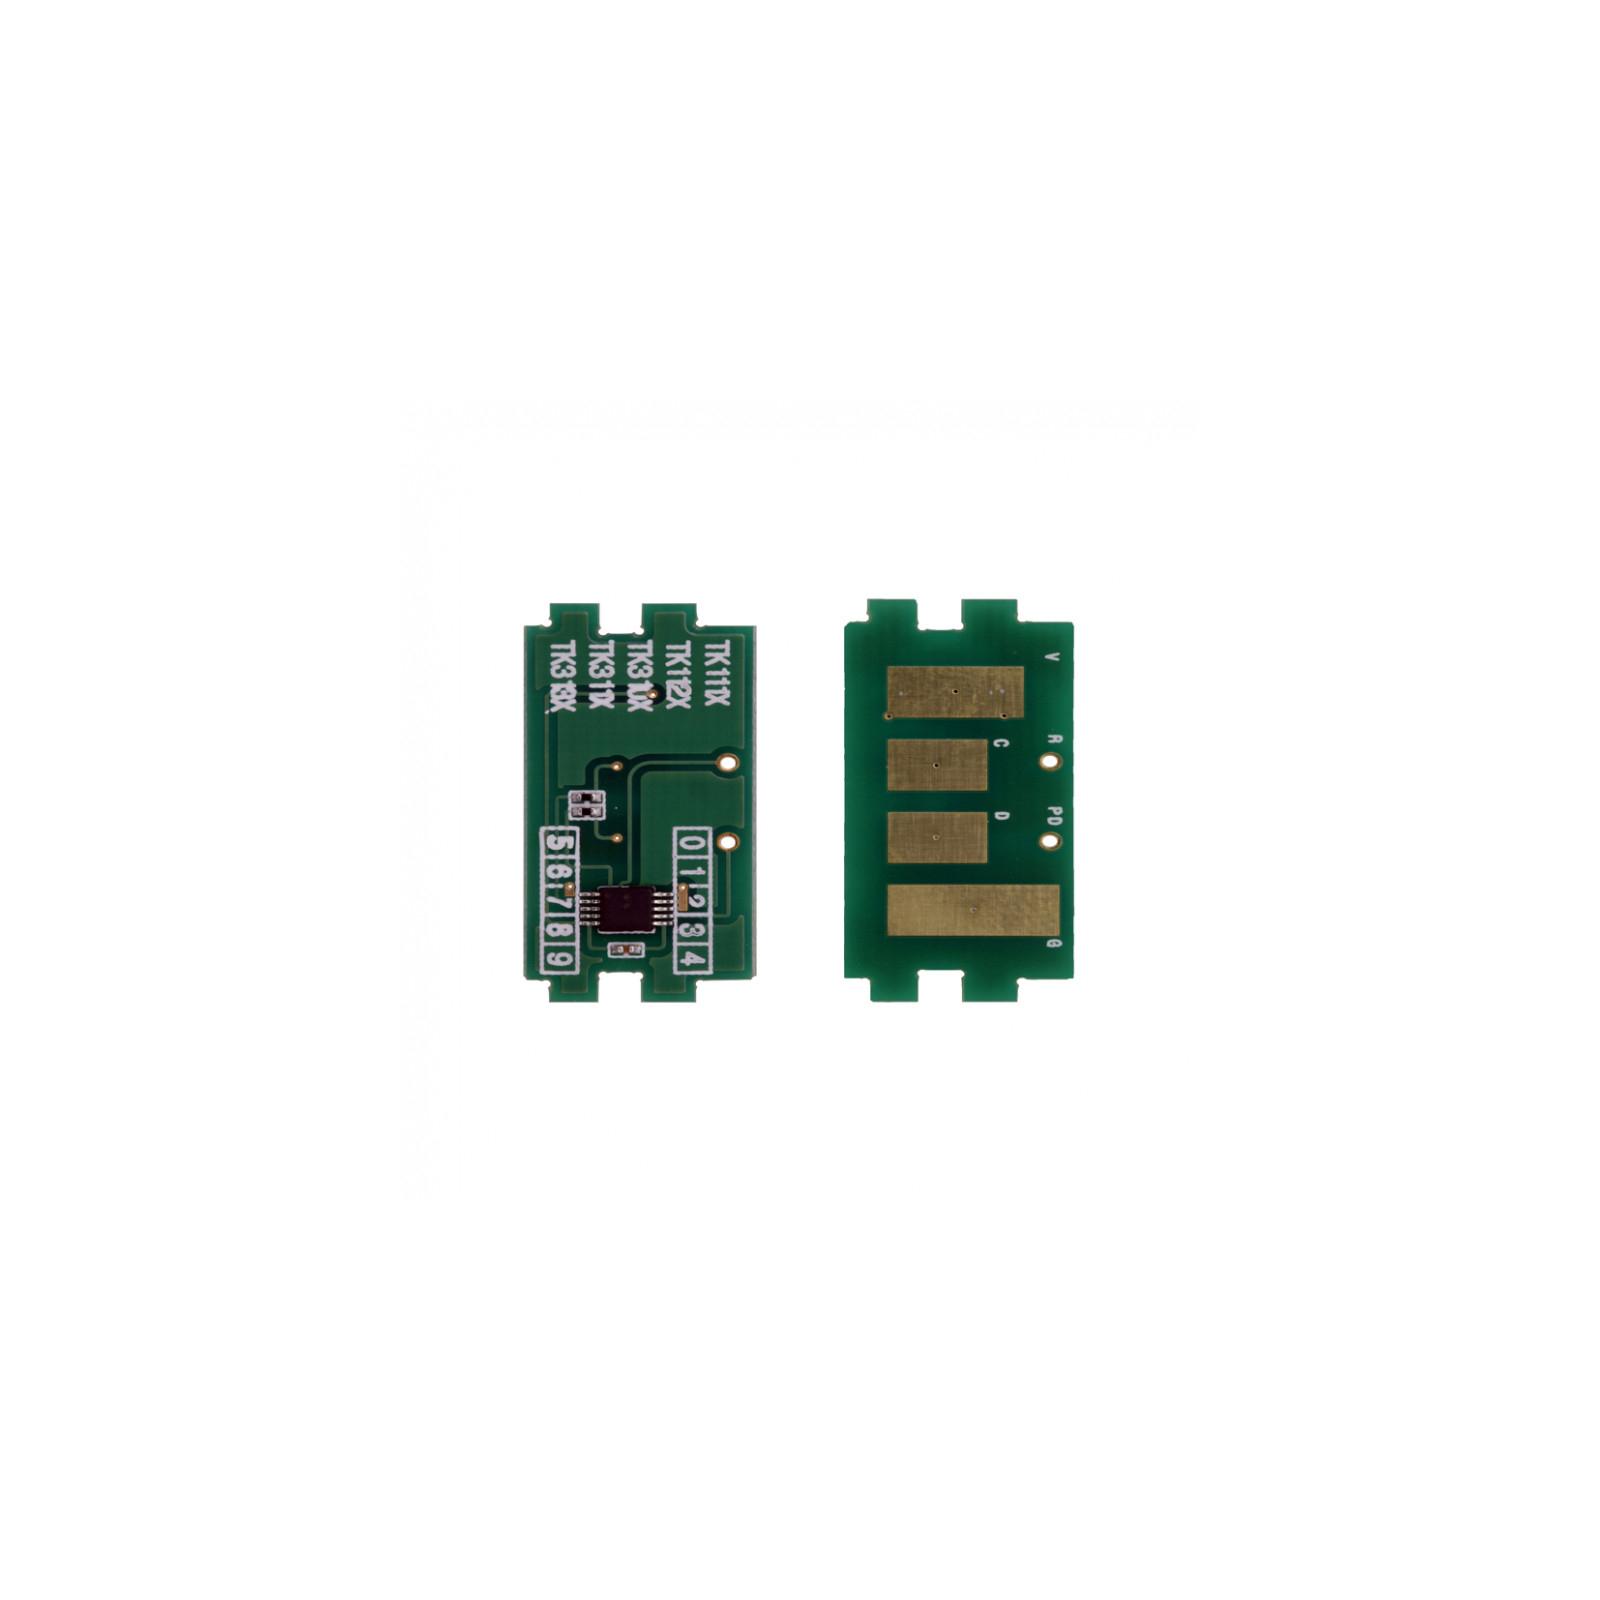 Чип для картриджа KyoceraFS-4200 (TK-3130) (EU/MEA/RU) 33.6k (MPS) Static Control (MPSTK3130CP-EU)